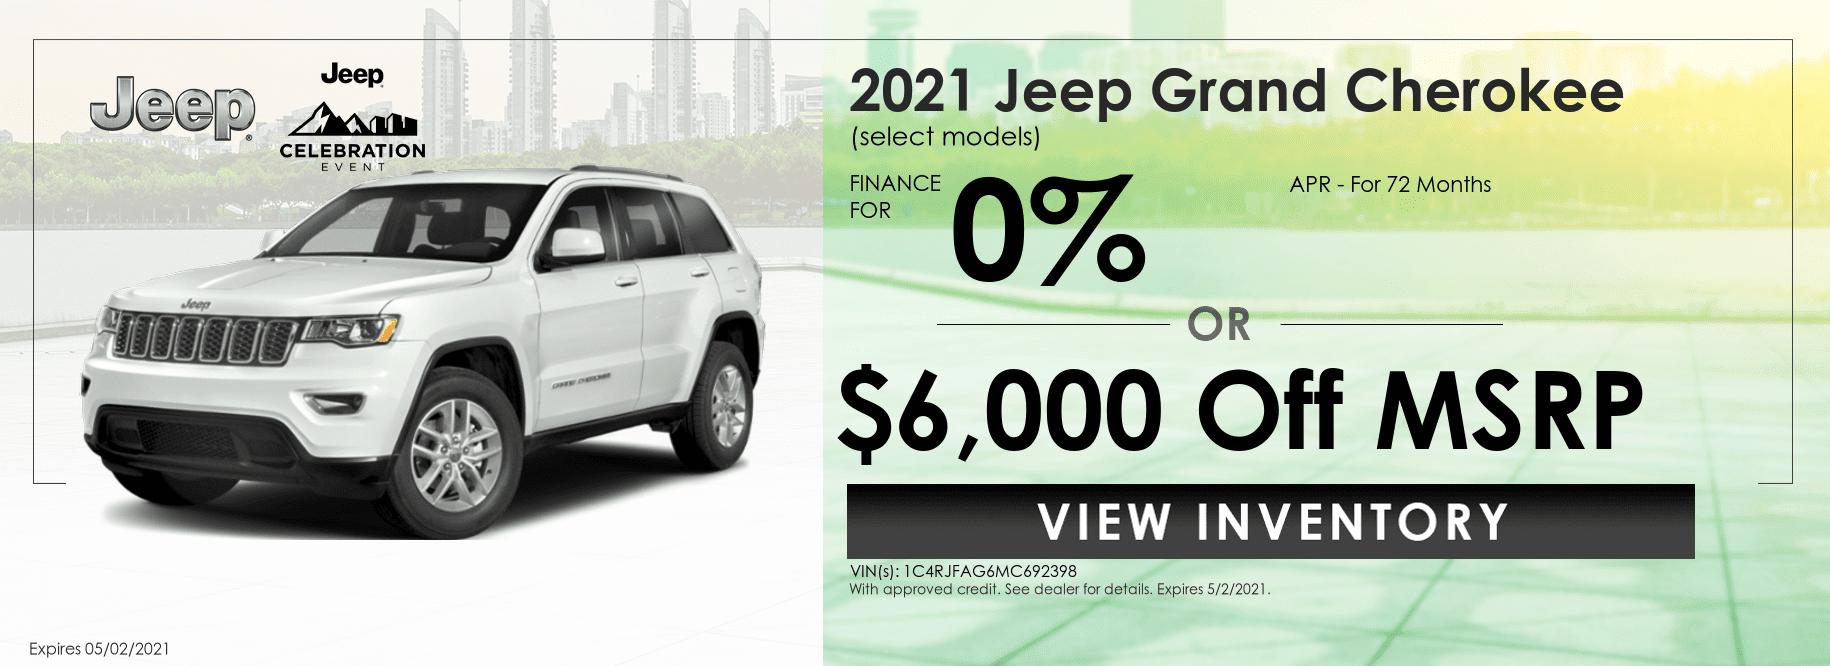 2021-Jeep-Grand-Cherokee-(select-models)-8